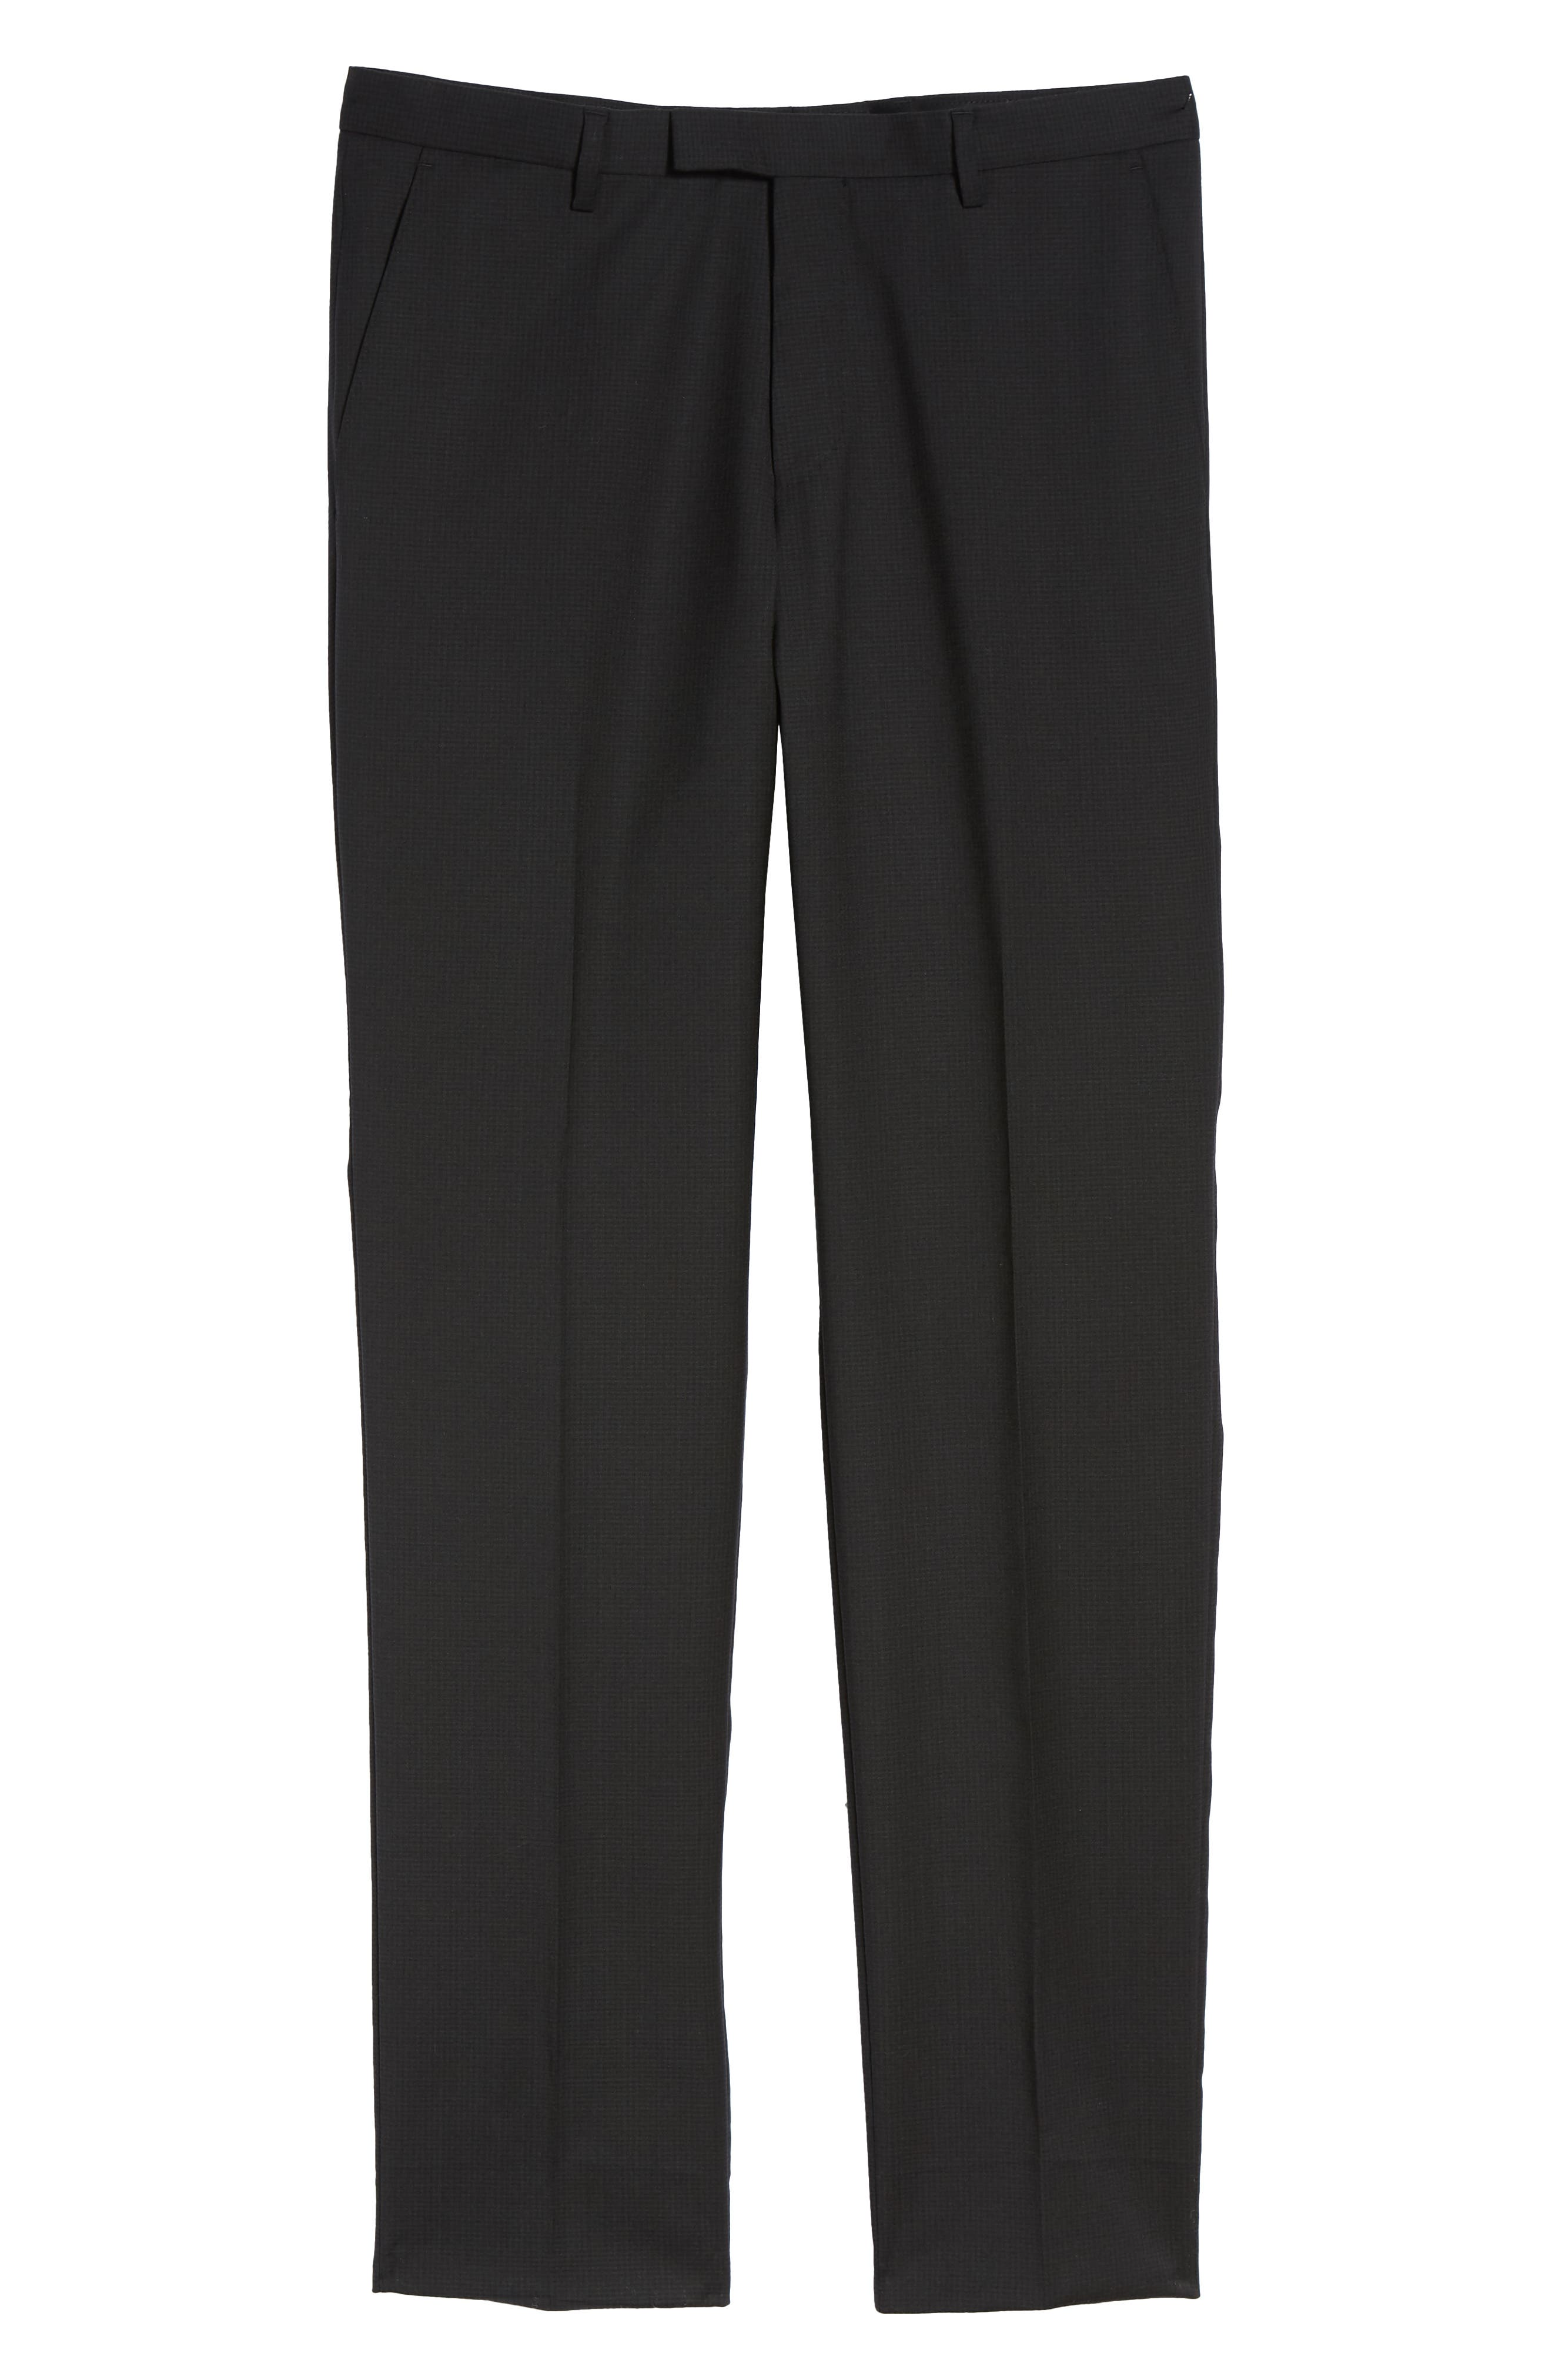 Leenon Flat Front Check Wool Trousers,                             Alternate thumbnail 6, color,                             BLACK